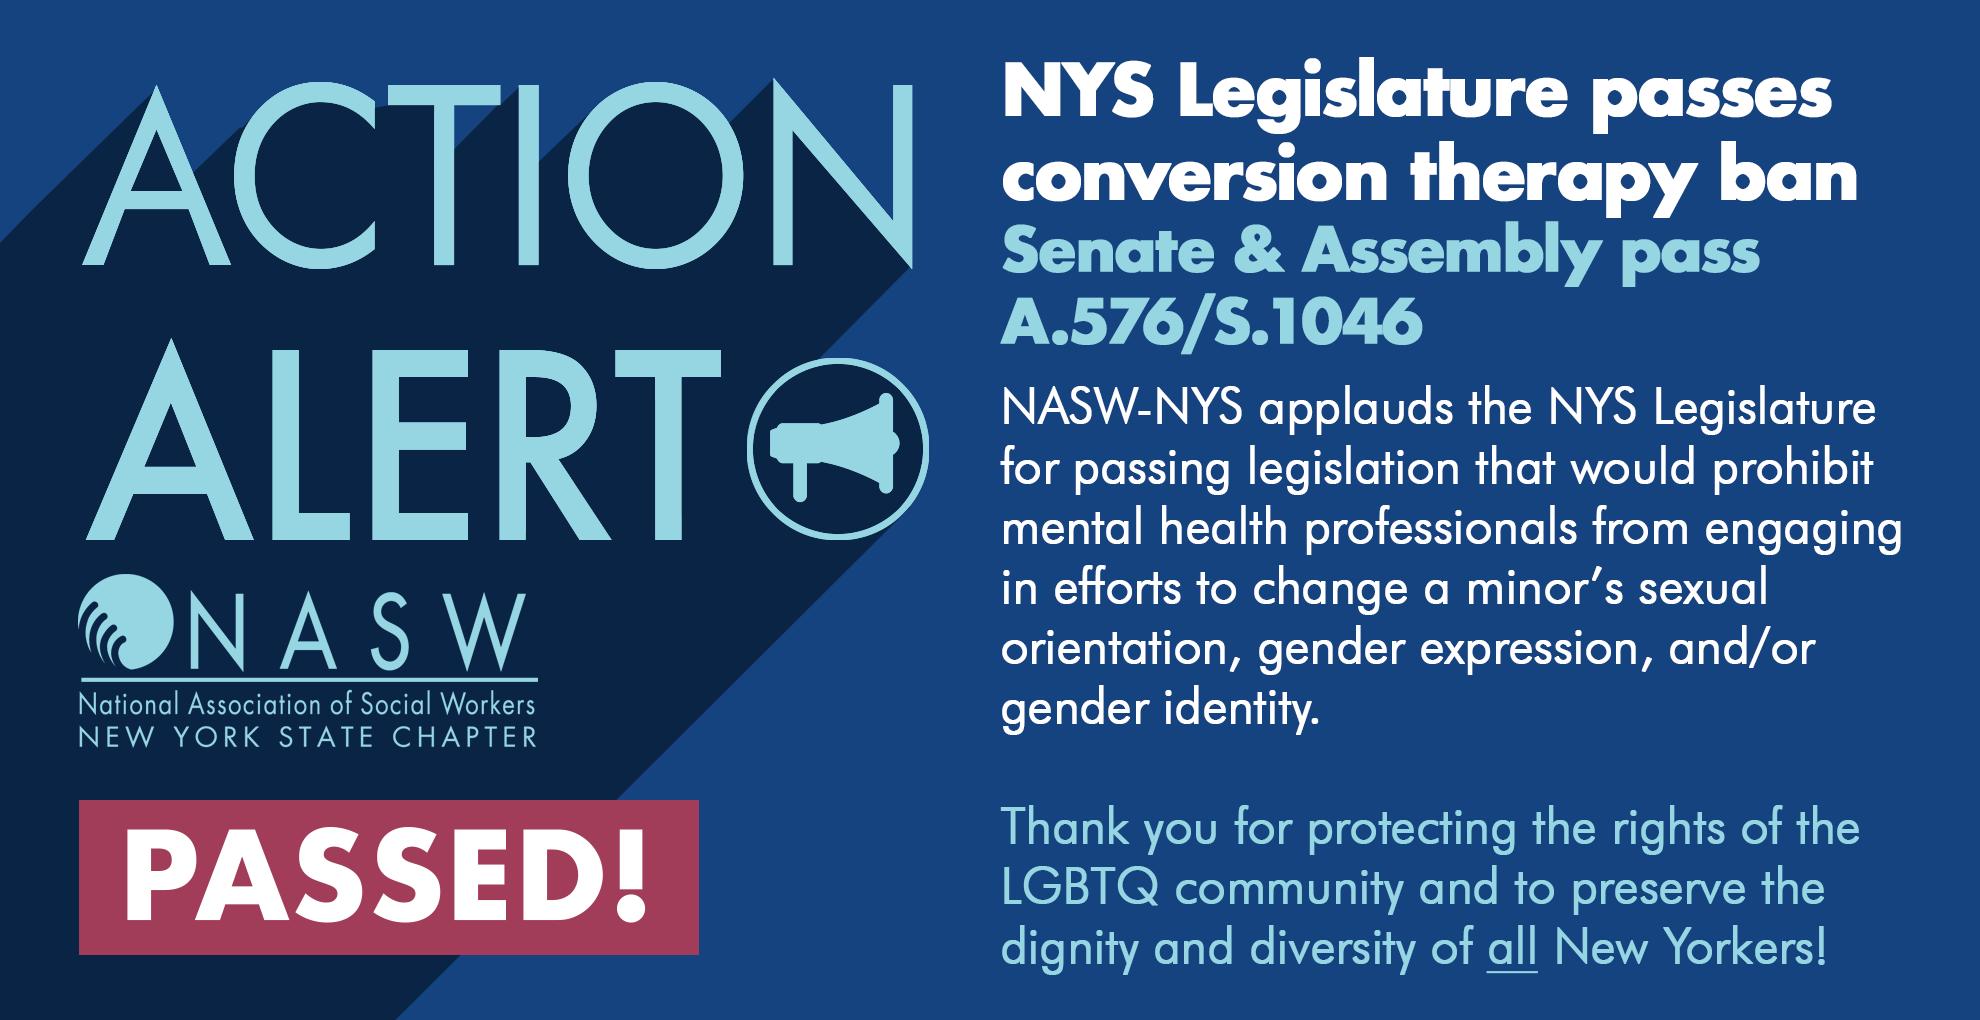 Legislative Victory Nys Legislature Passes Ban On Conversion